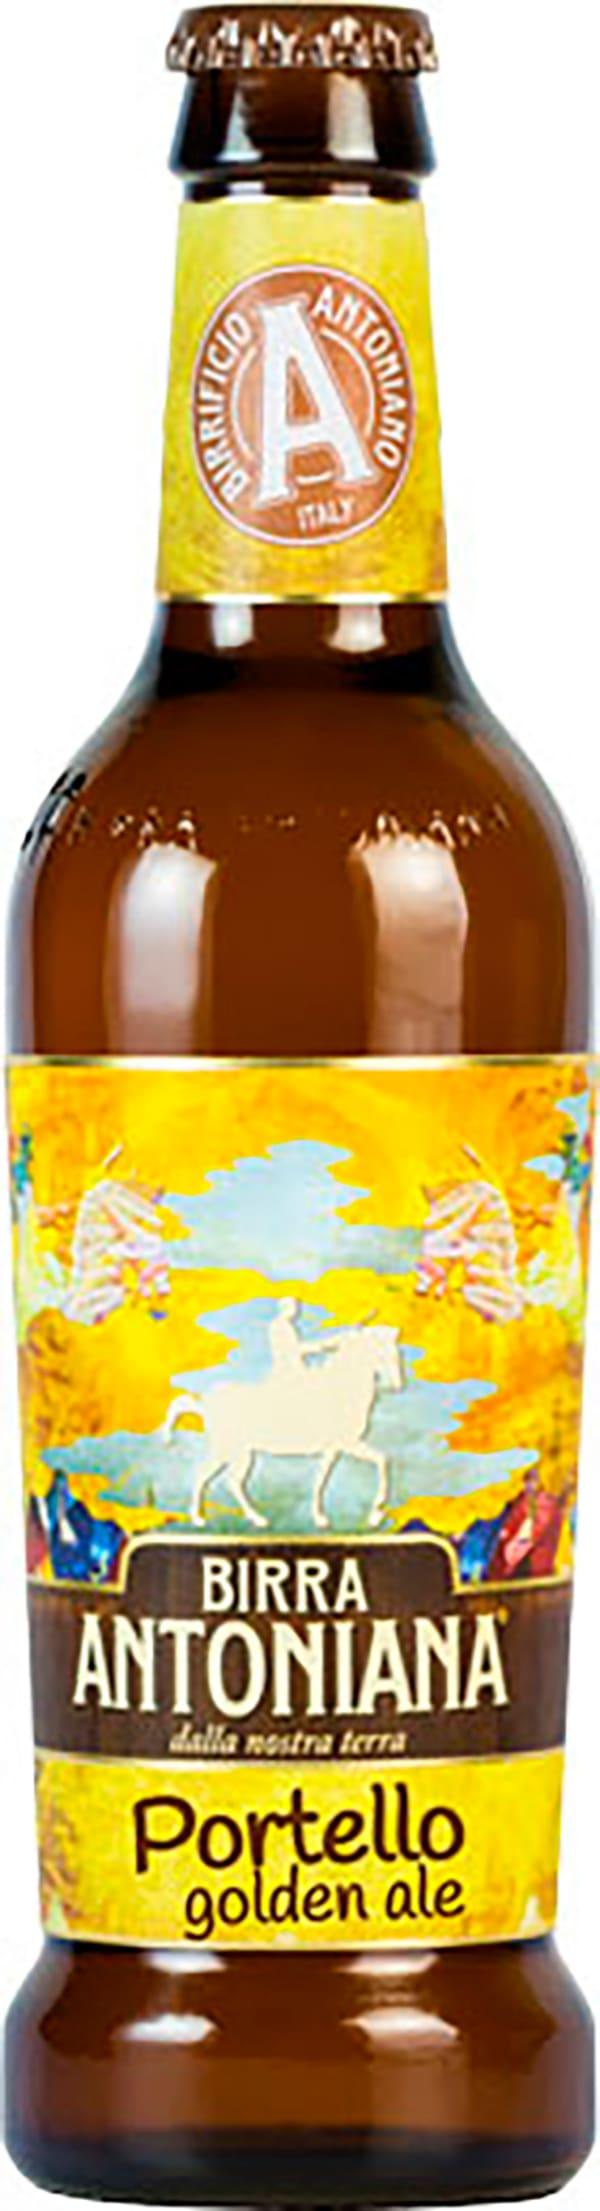 Birra Antoniana Portello Golden Ale